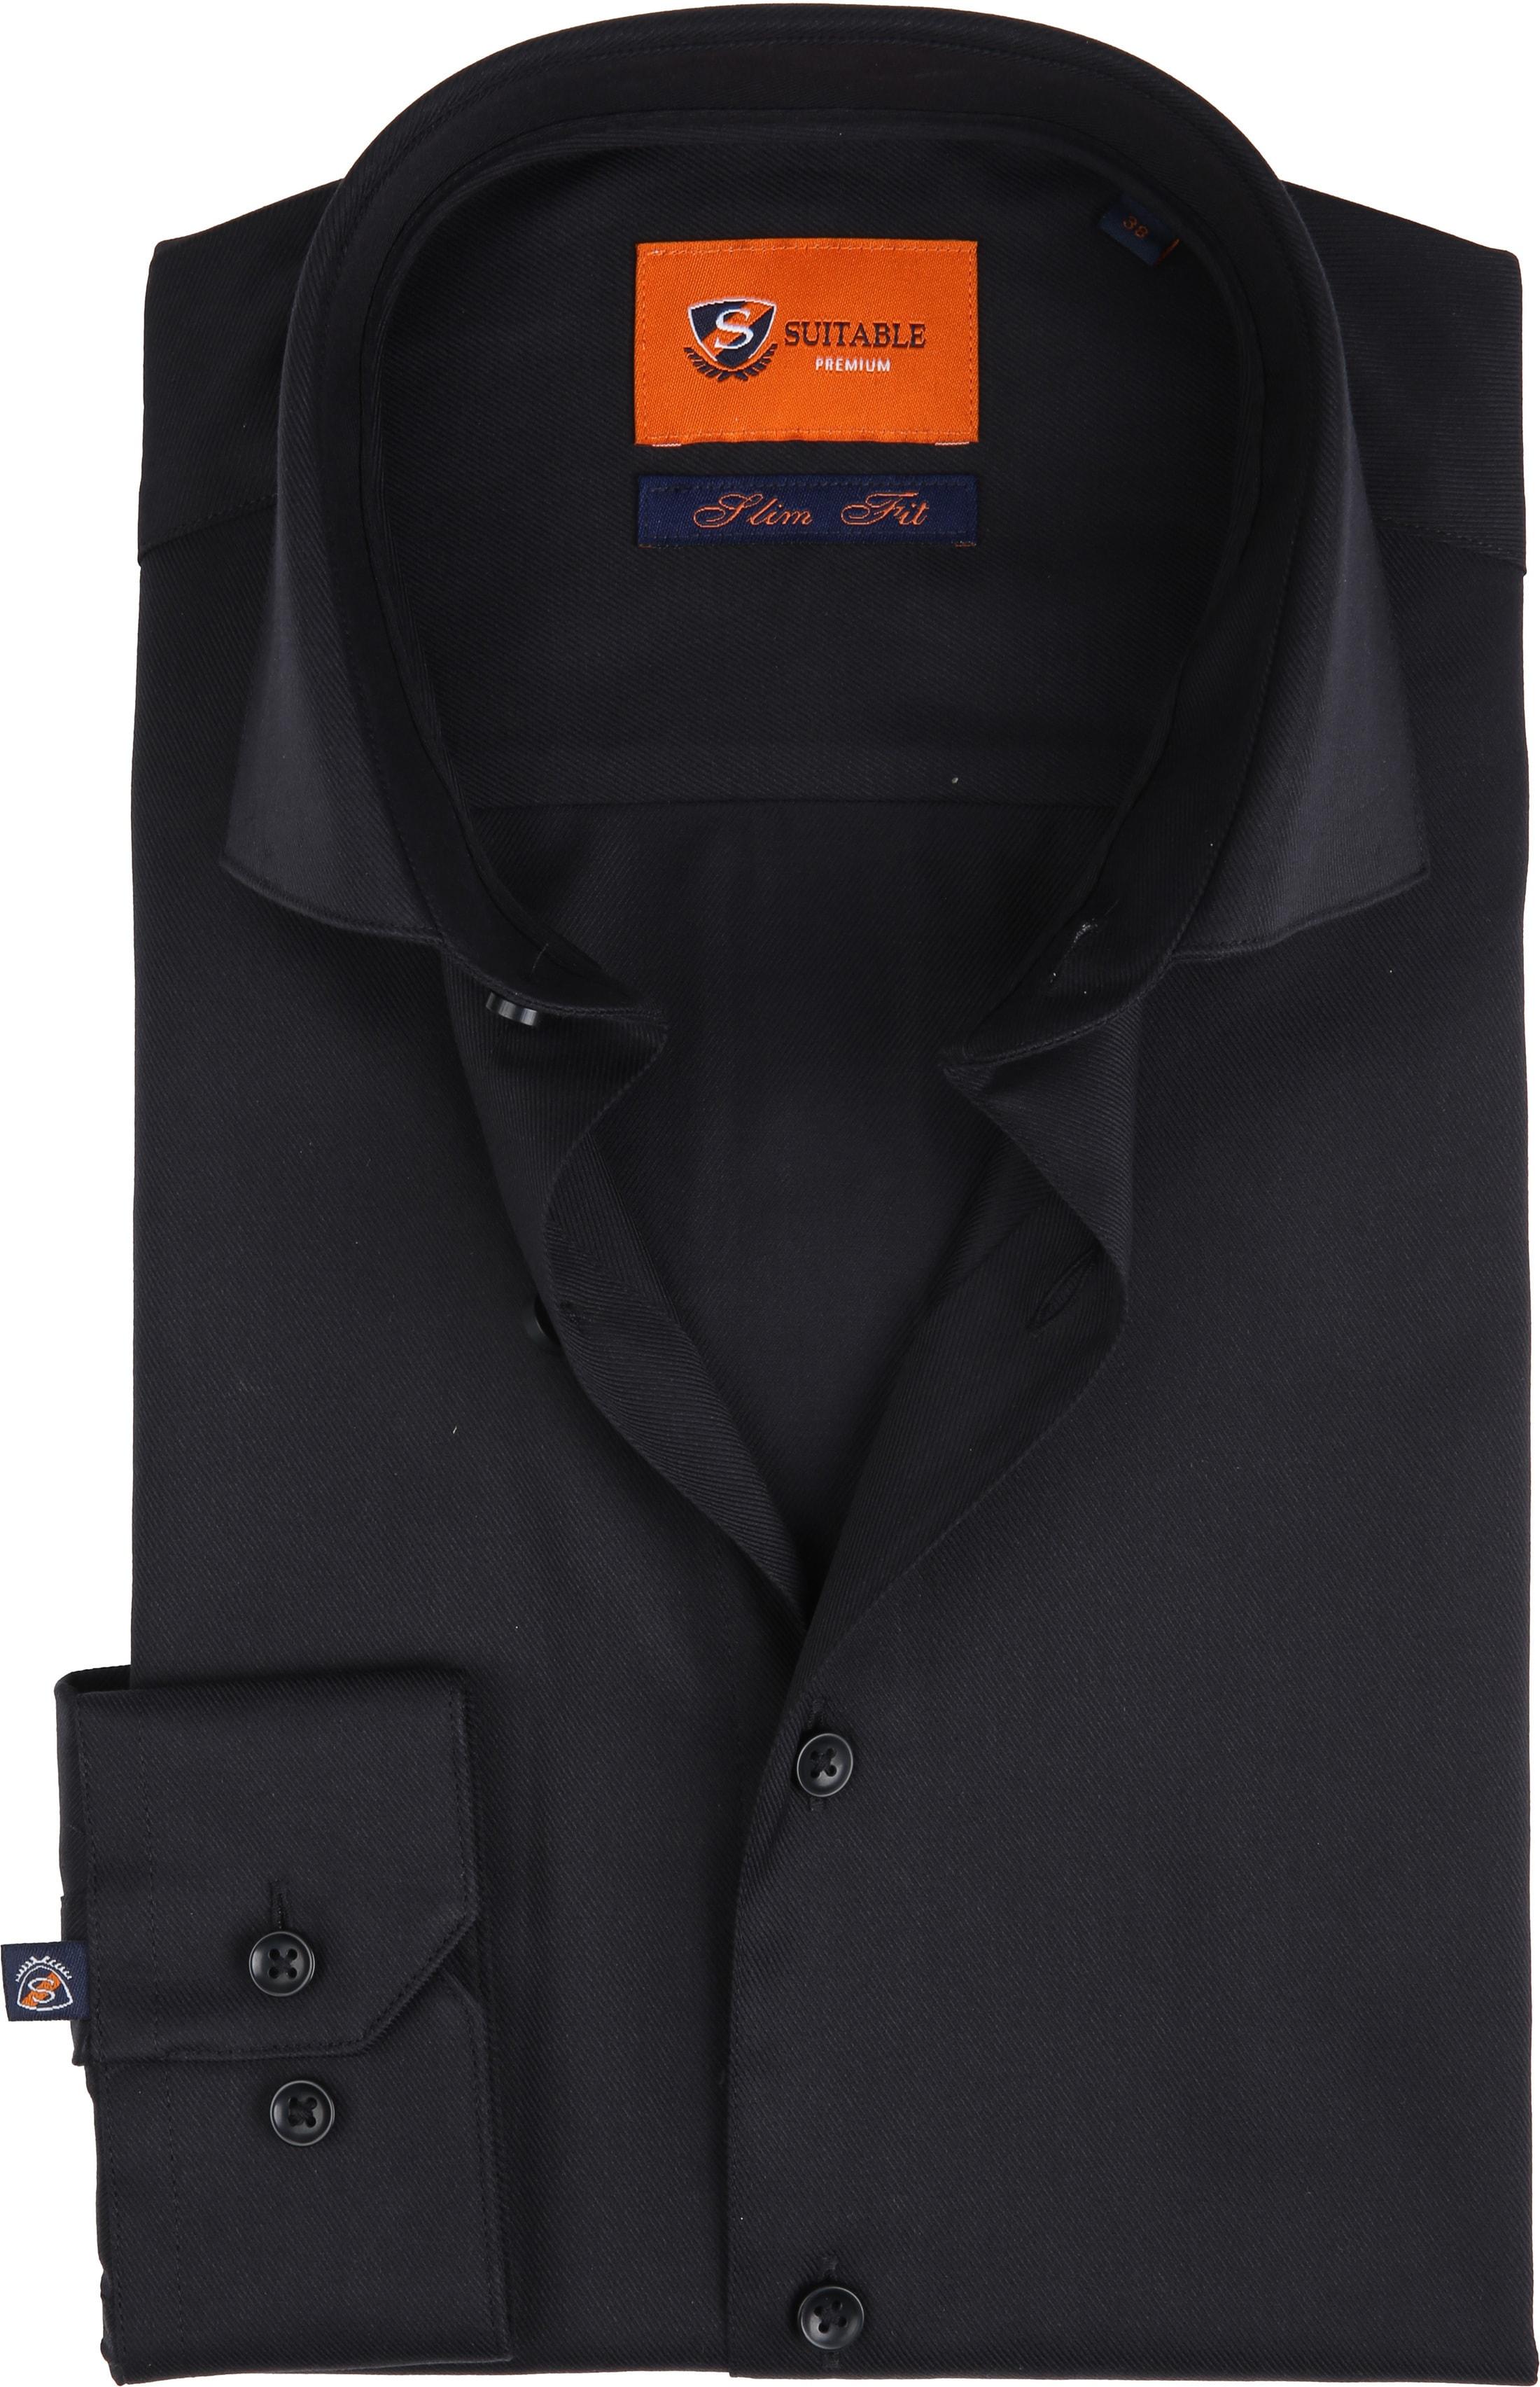 Suitable Shirt Black Pepita foto 0